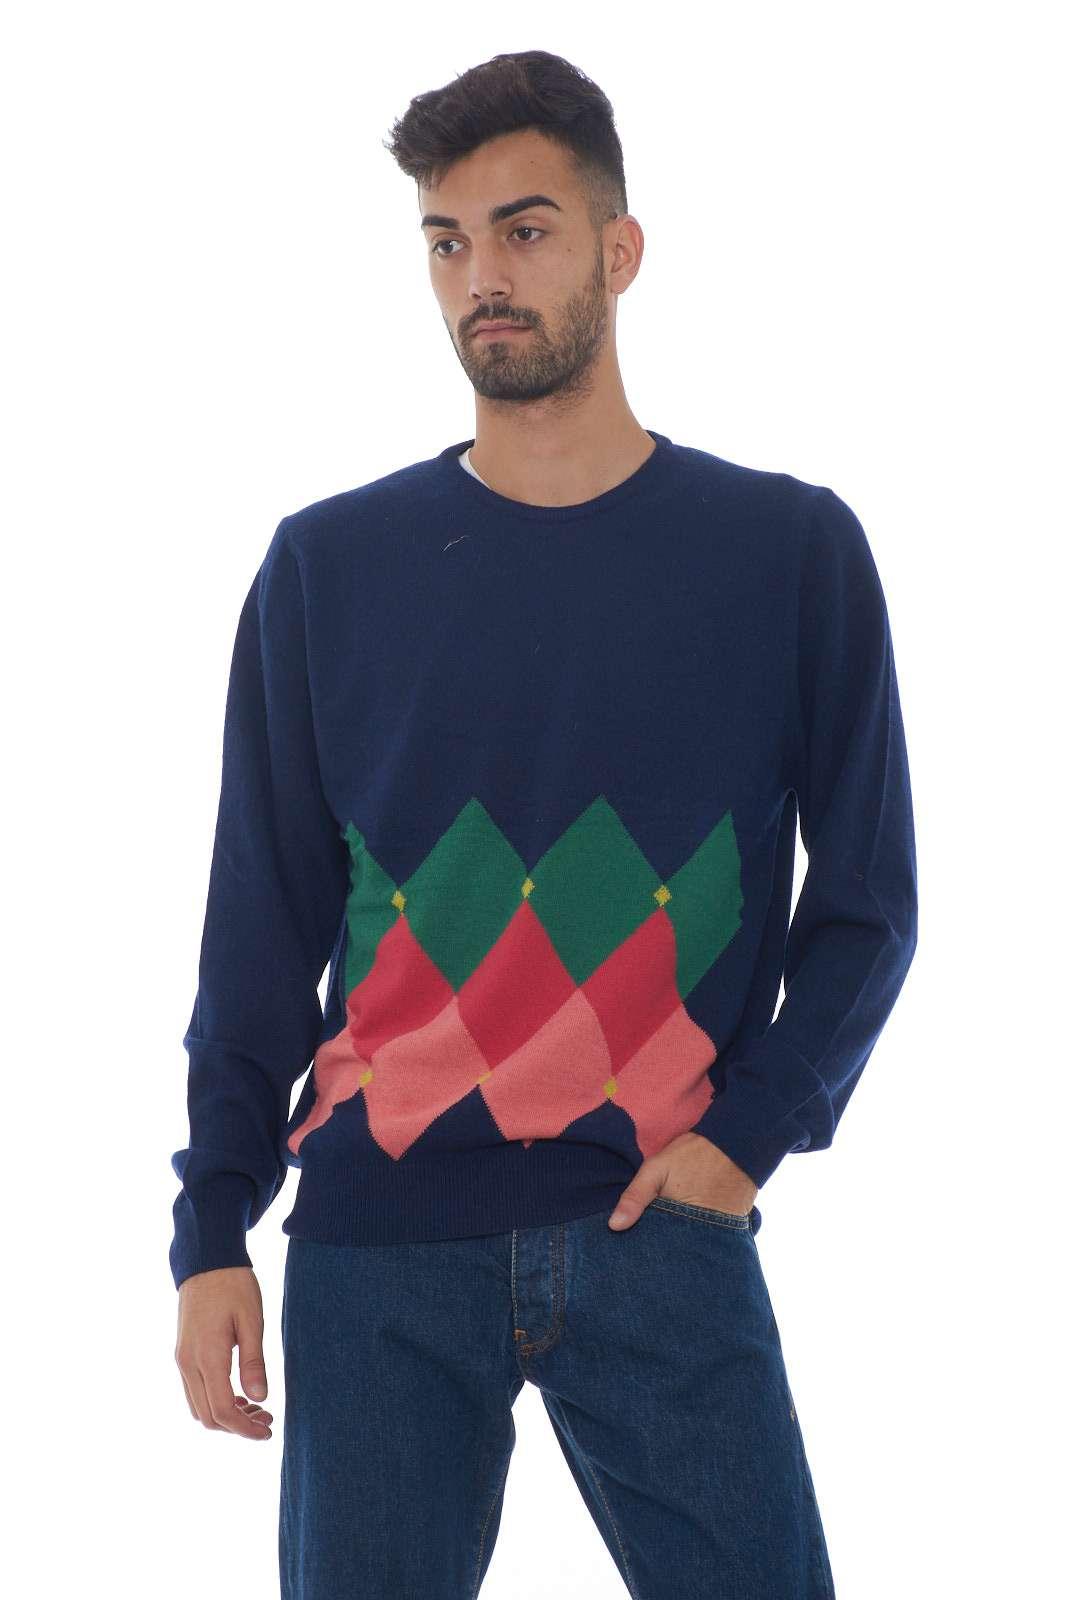 https://www.parmax.com/media/catalog/product/a/i/AI-outlet_parmax-maglia-uomo-Acquapura-006-A.jpg